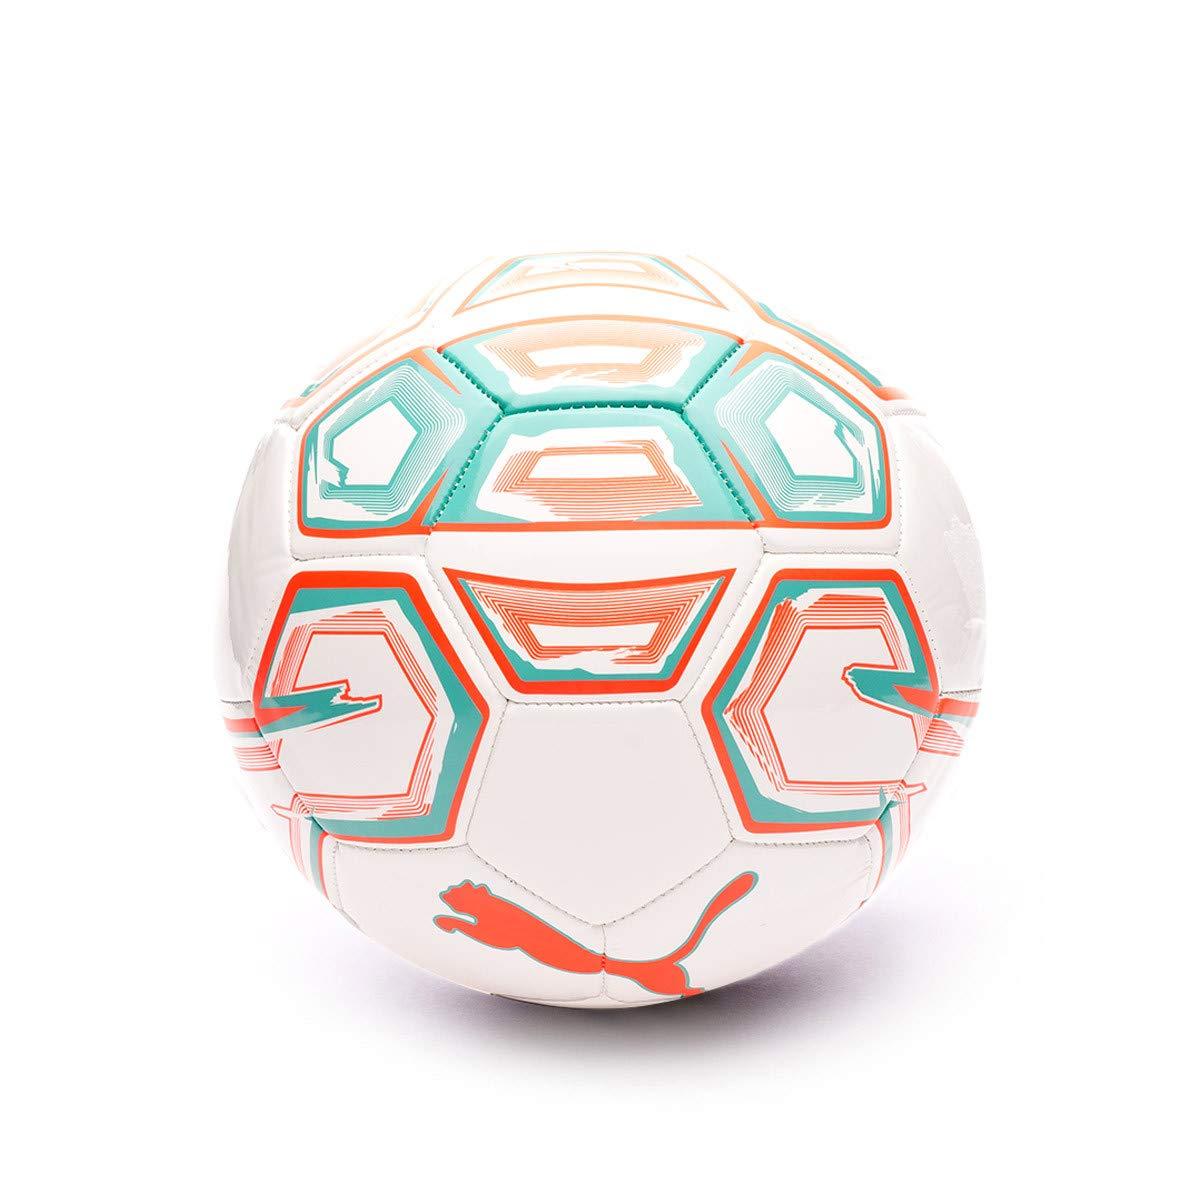 Puma Balon Futsal 1 Trainer MS Blanco - T4: Amazon.es: Deportes y ...